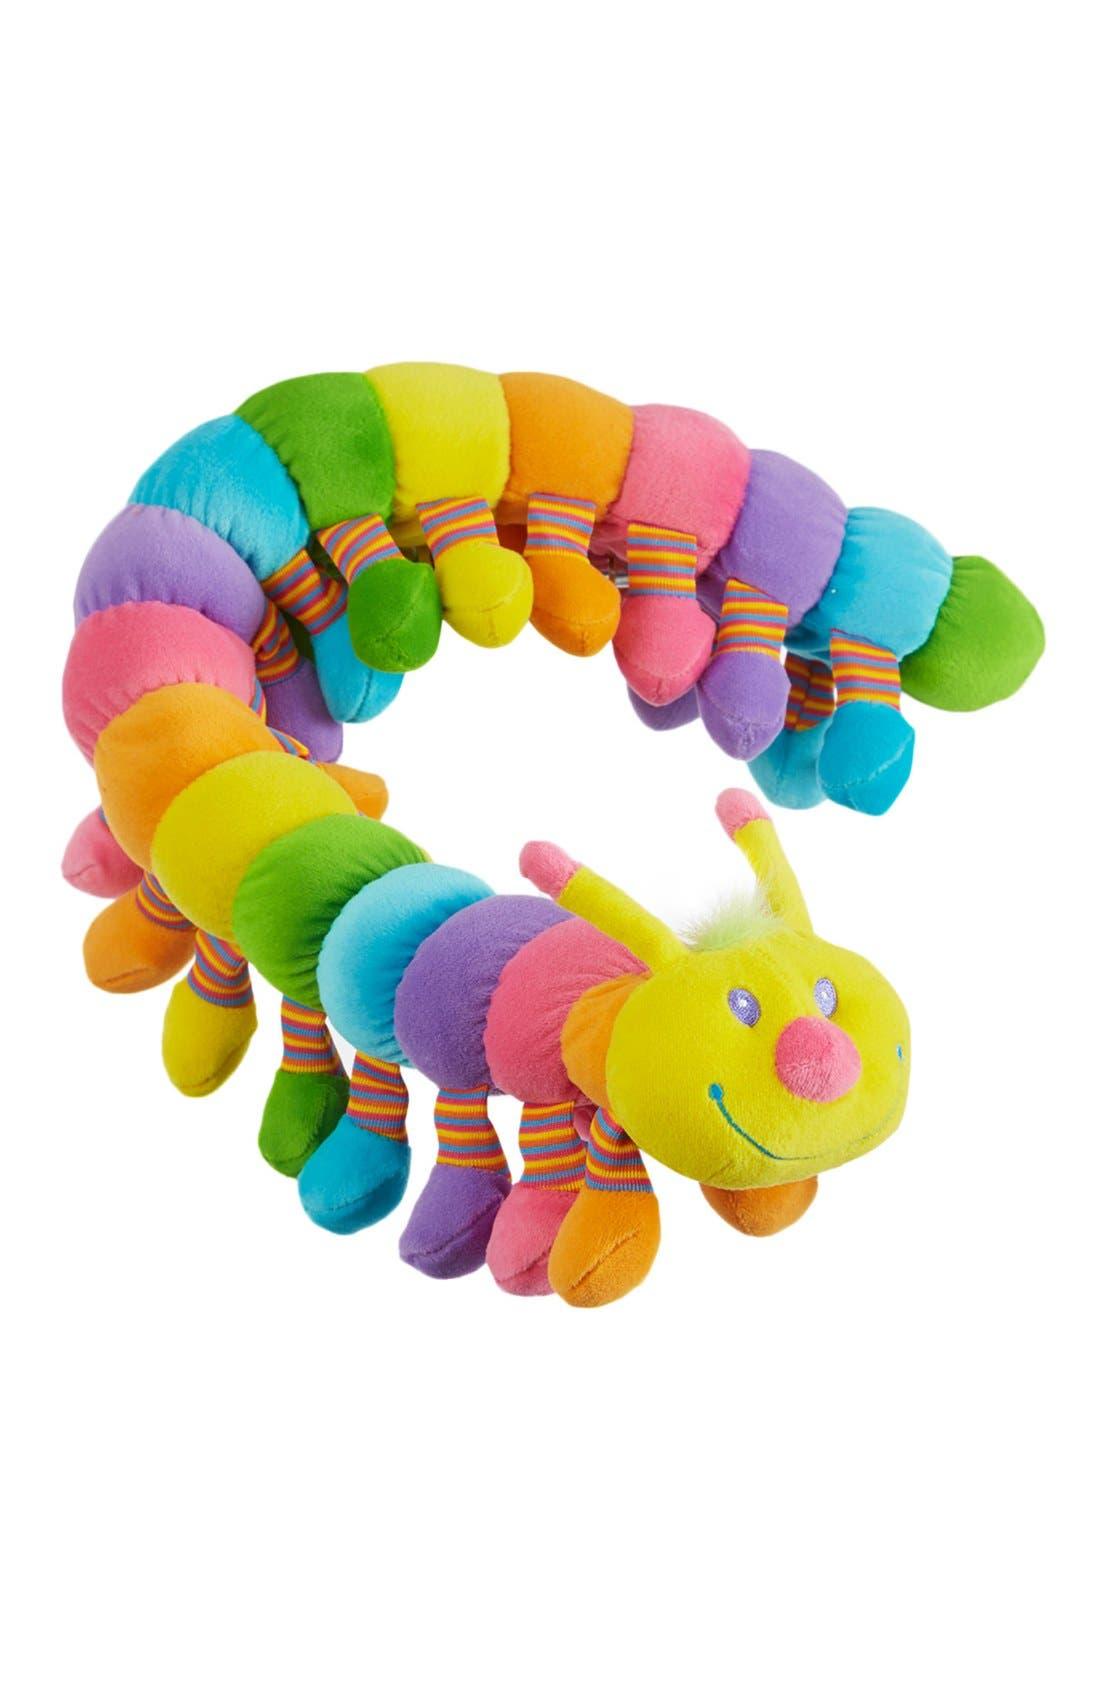 'Longfellow' Plush Caterpillar,                             Alternate thumbnail 2, color,                             Yellow